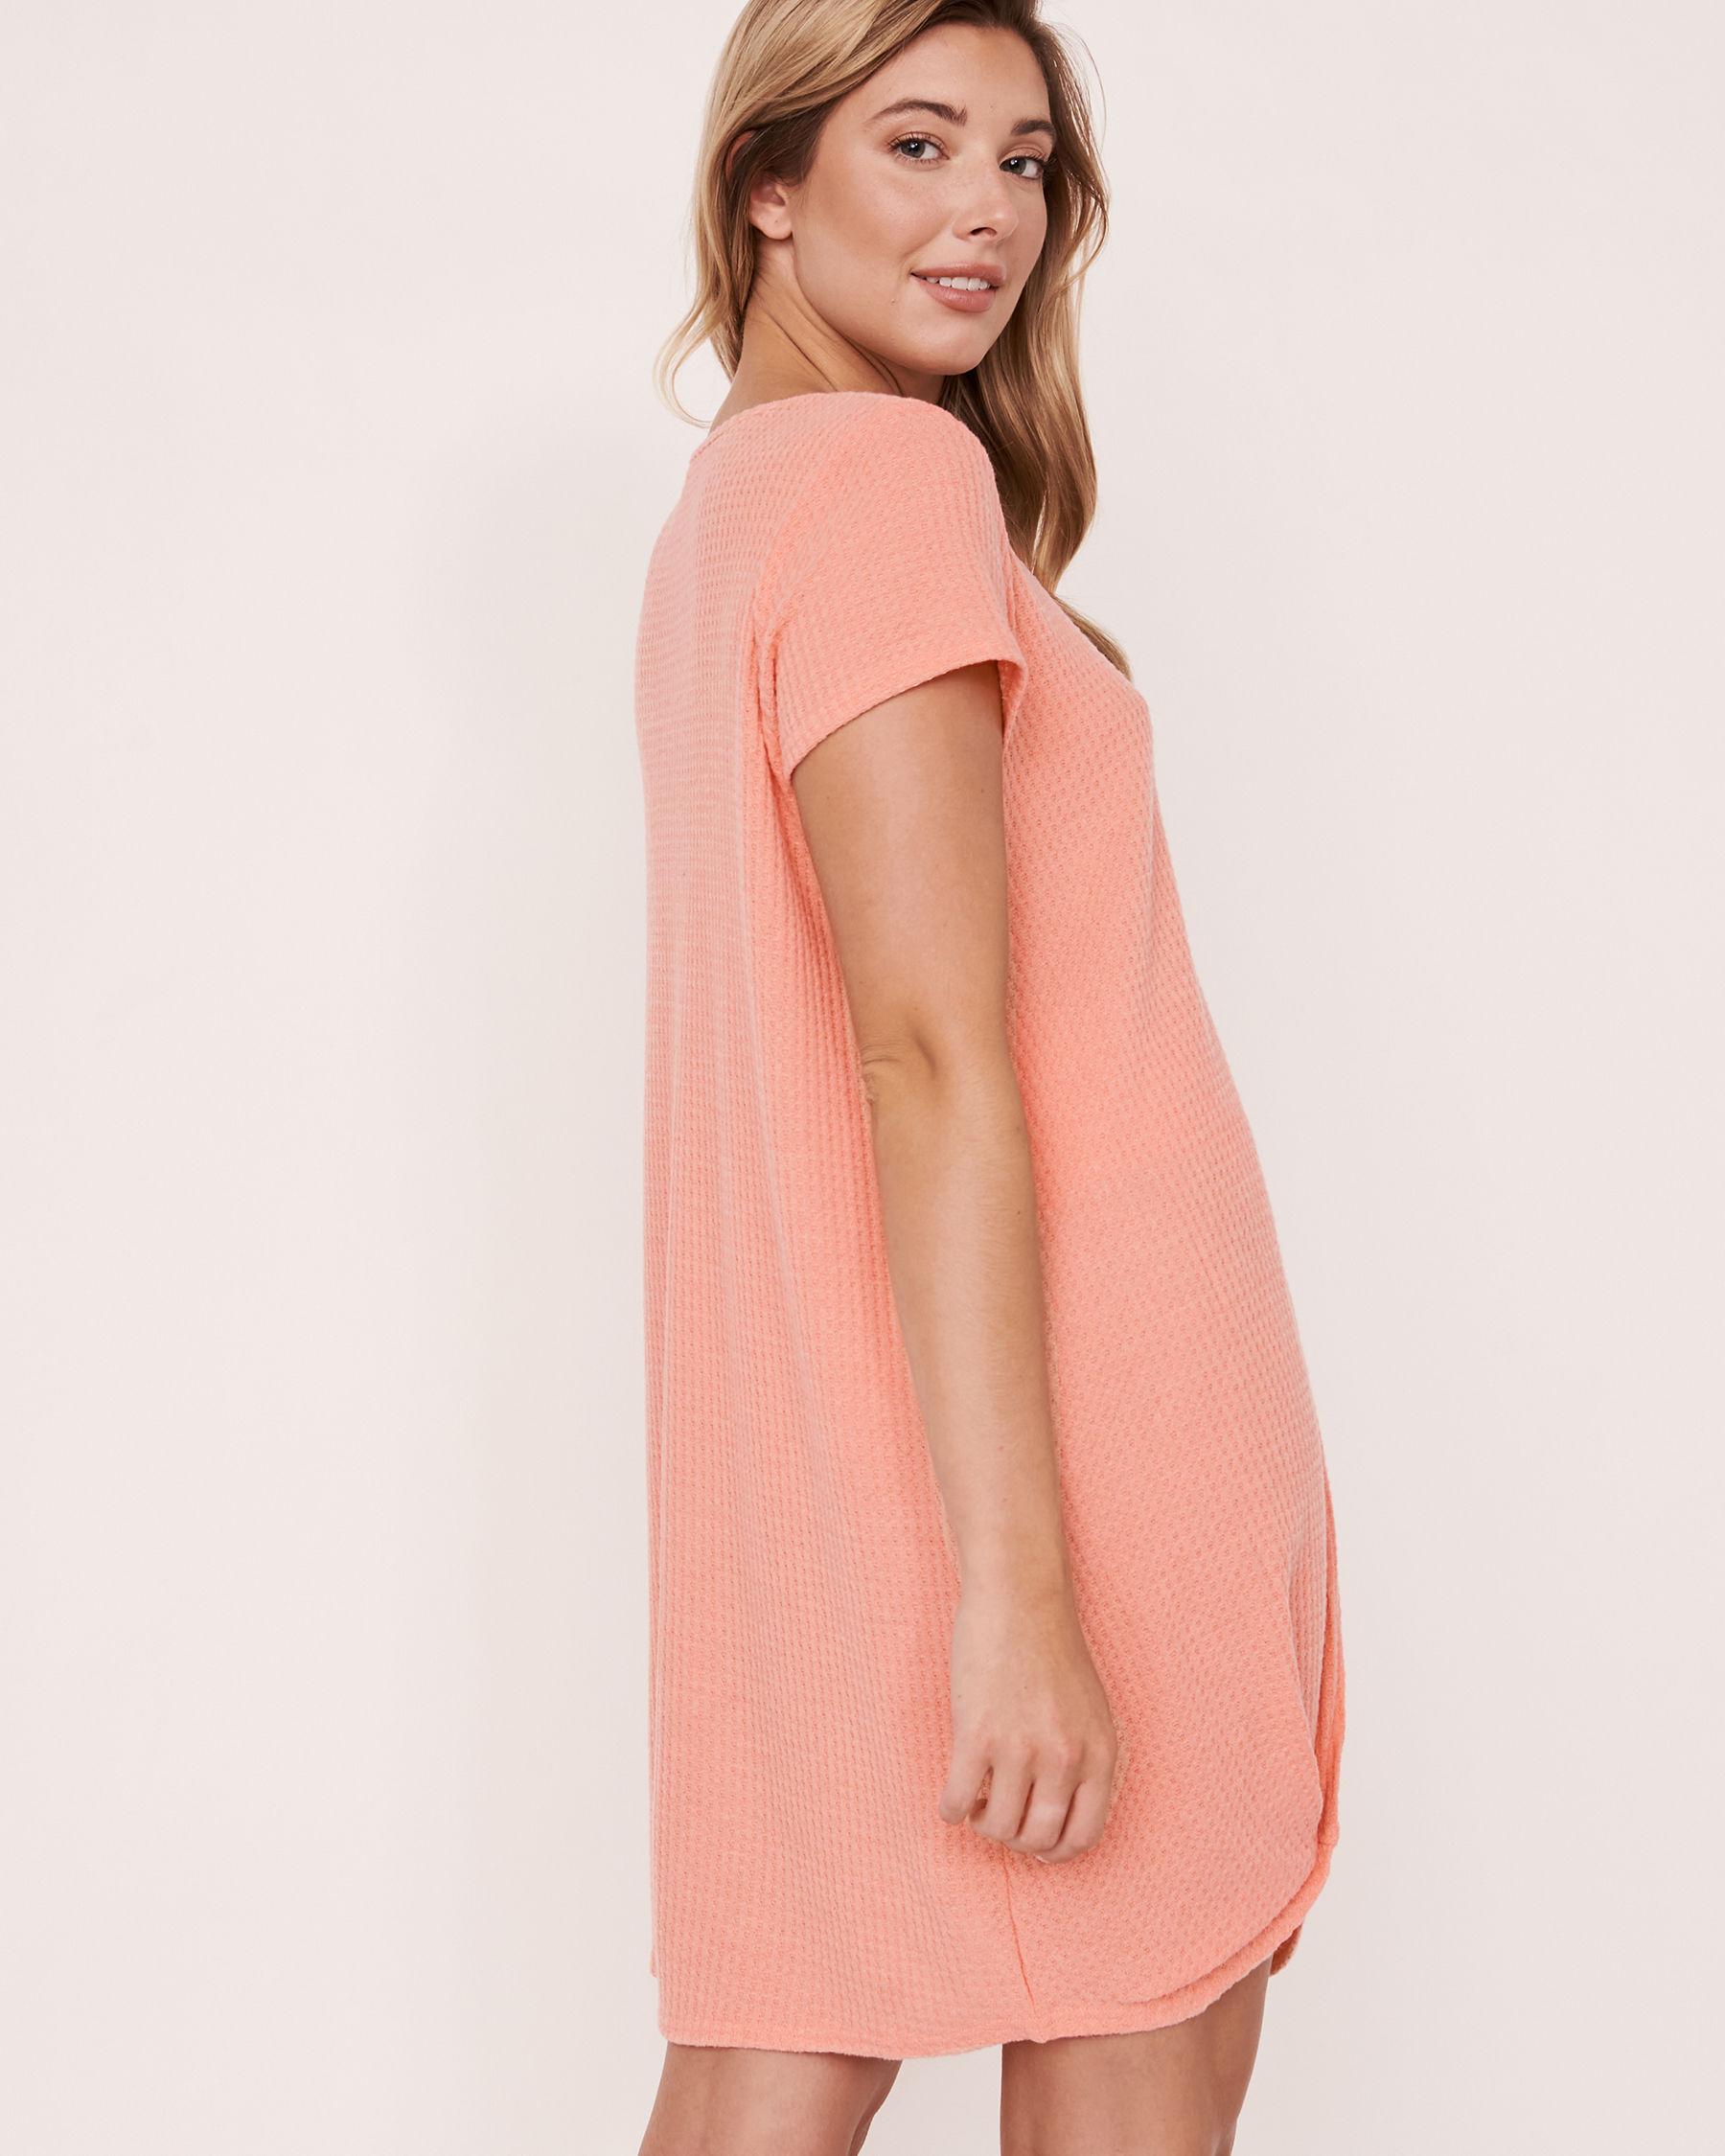 LA VIE EN ROSE AQUA Twisted Short Dress Coral 80300017 - View2